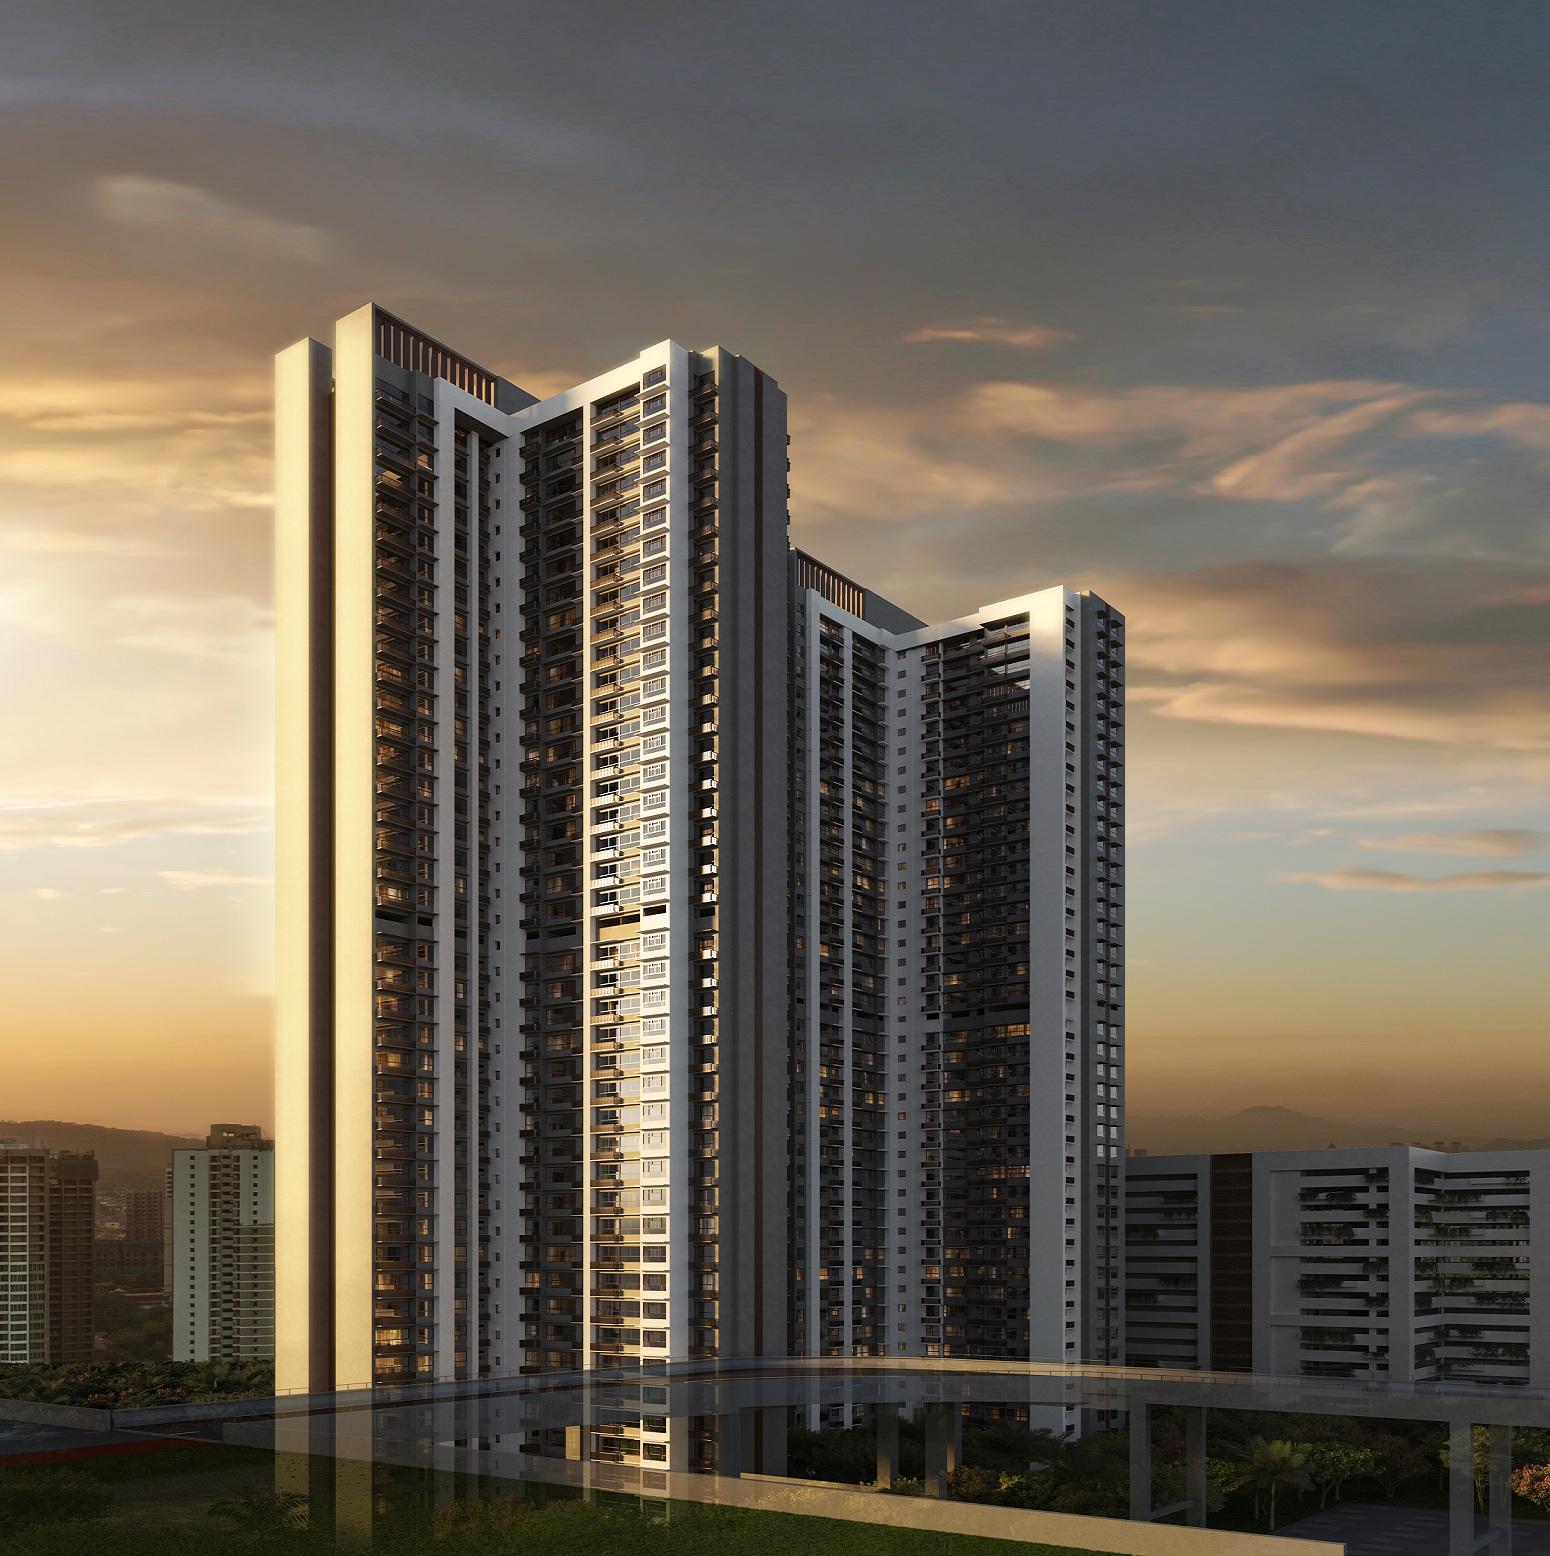 piramal vaikunth project tower view2